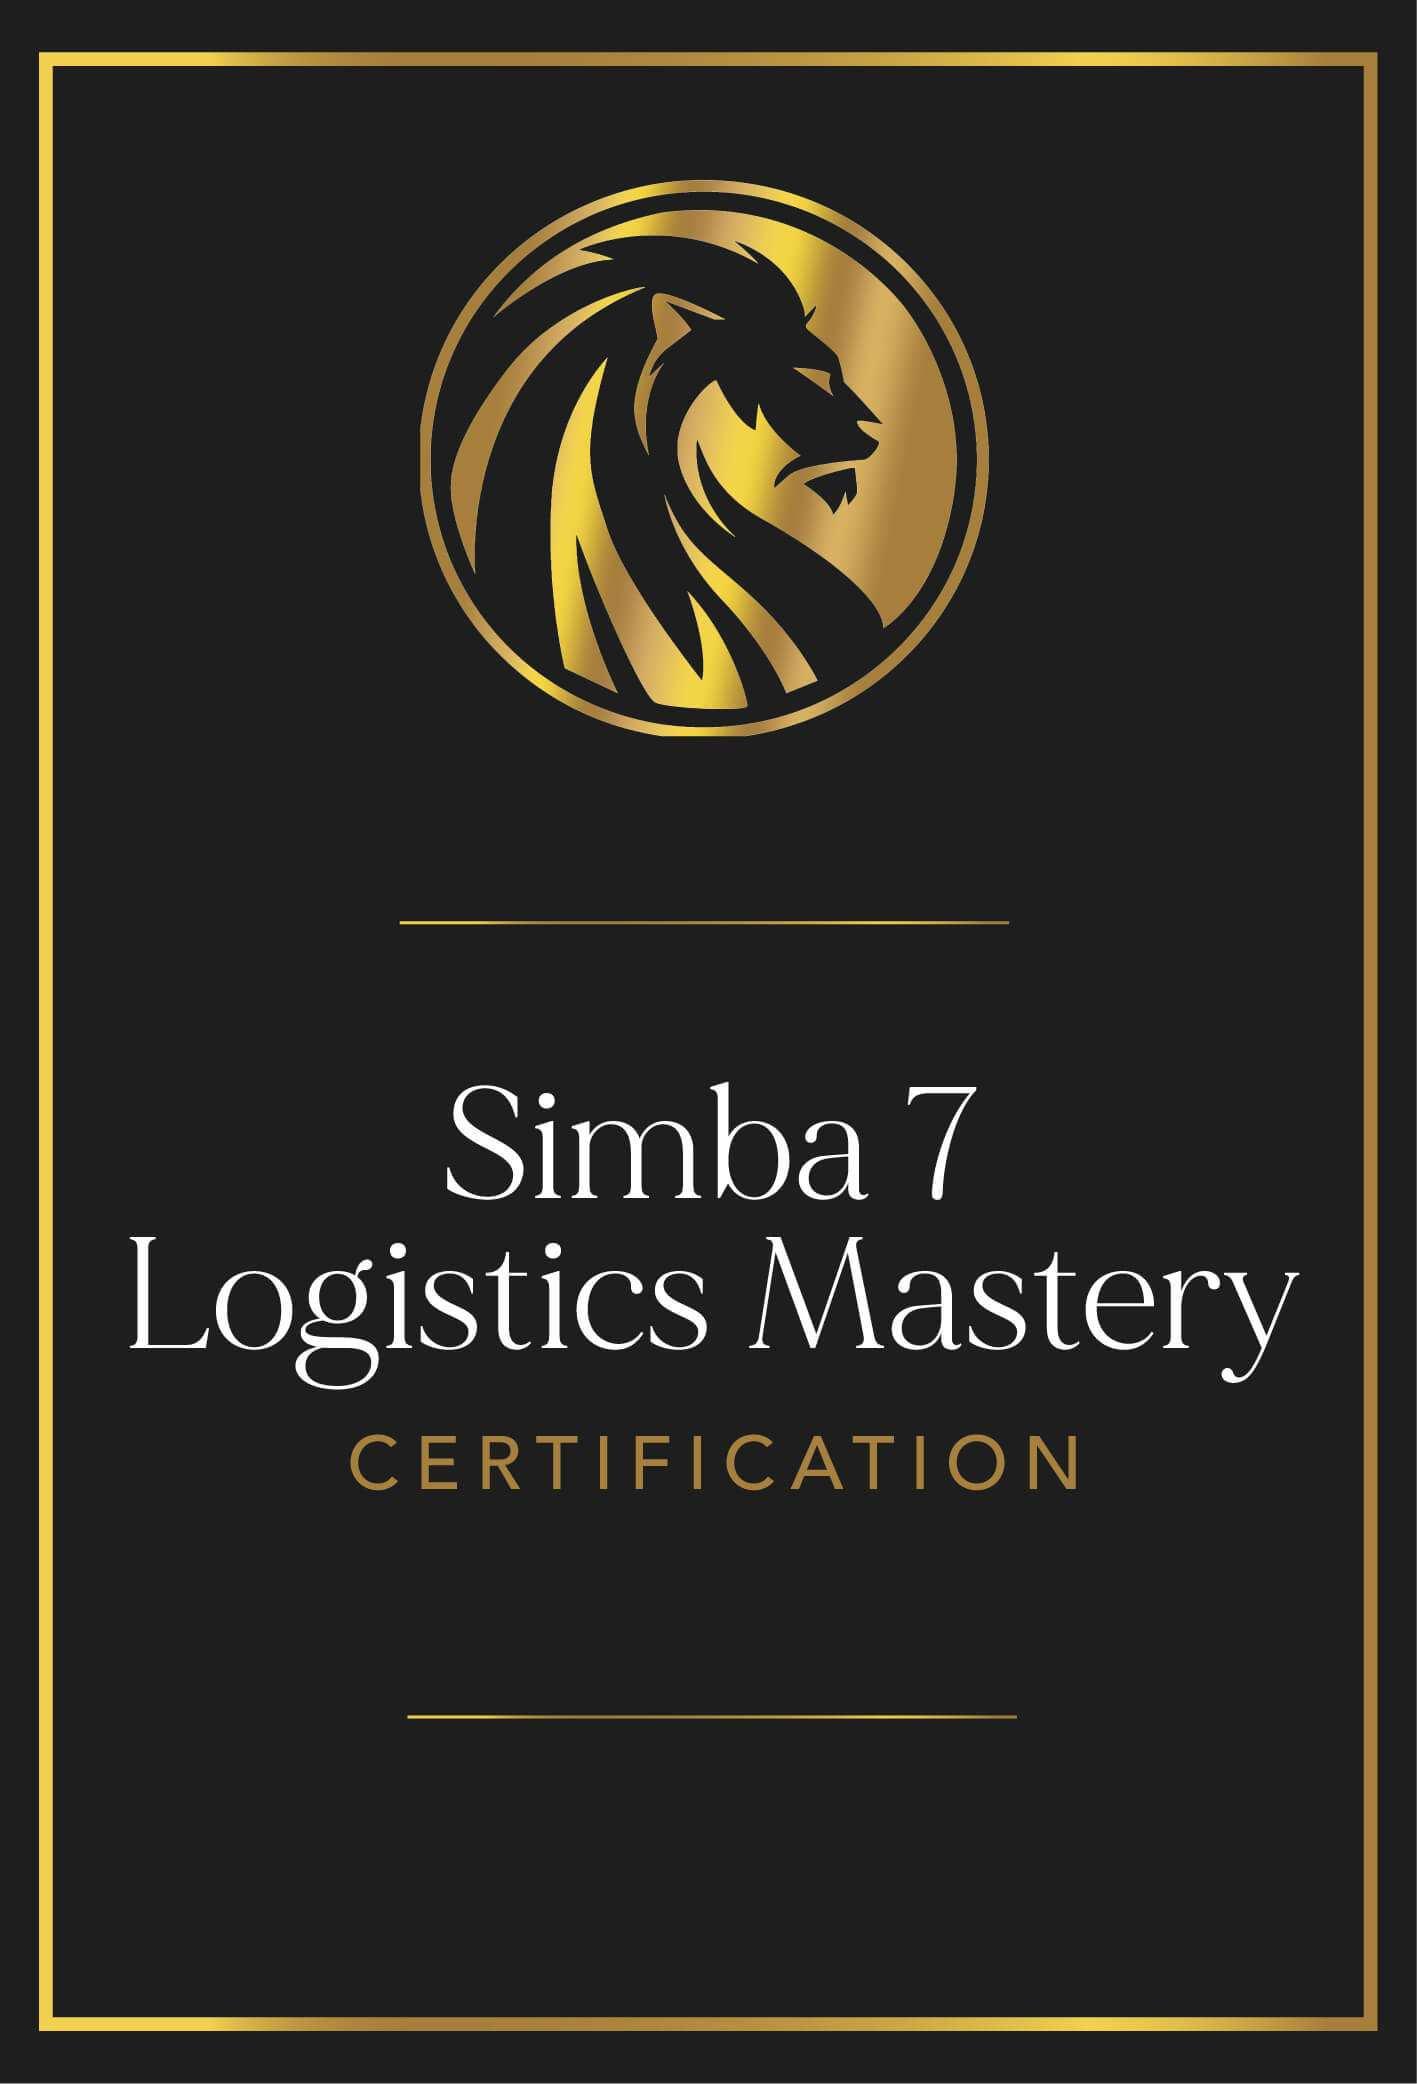 Simba 7 Logistics Mastery Certification